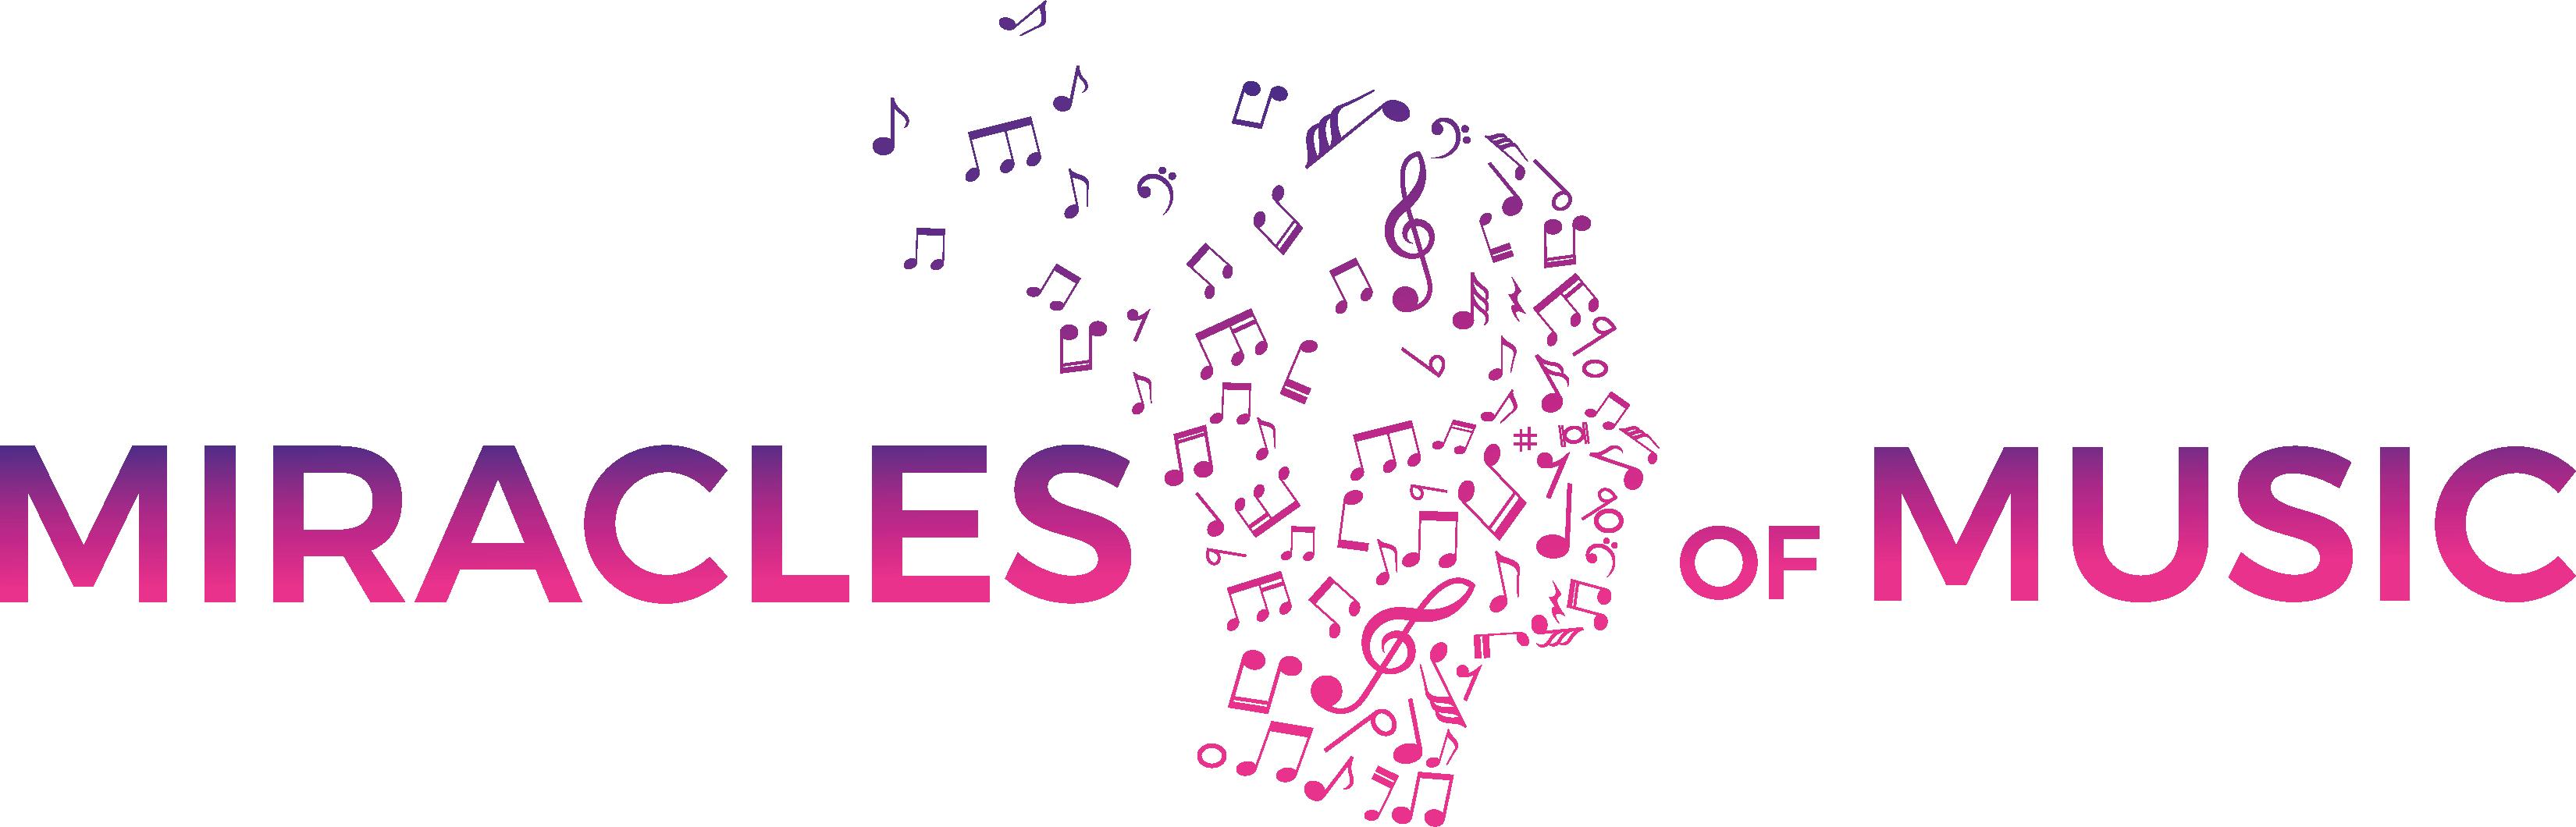 Muziek raakt iedereen